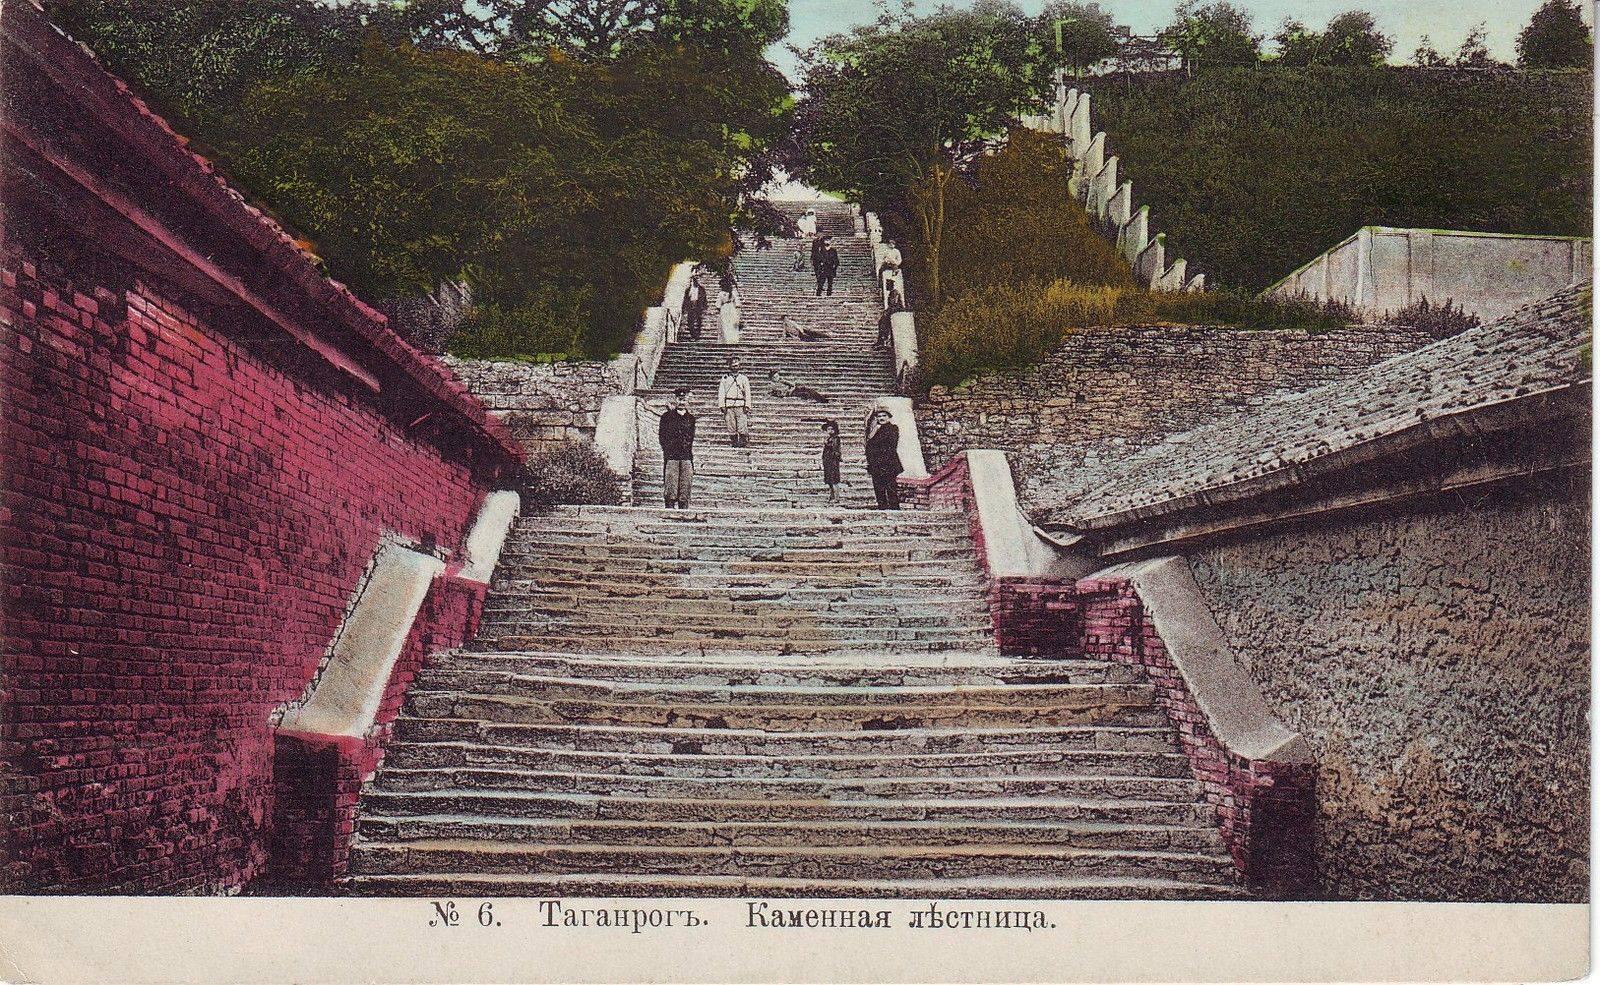 Картинки по запросу каменная лестница таганрог